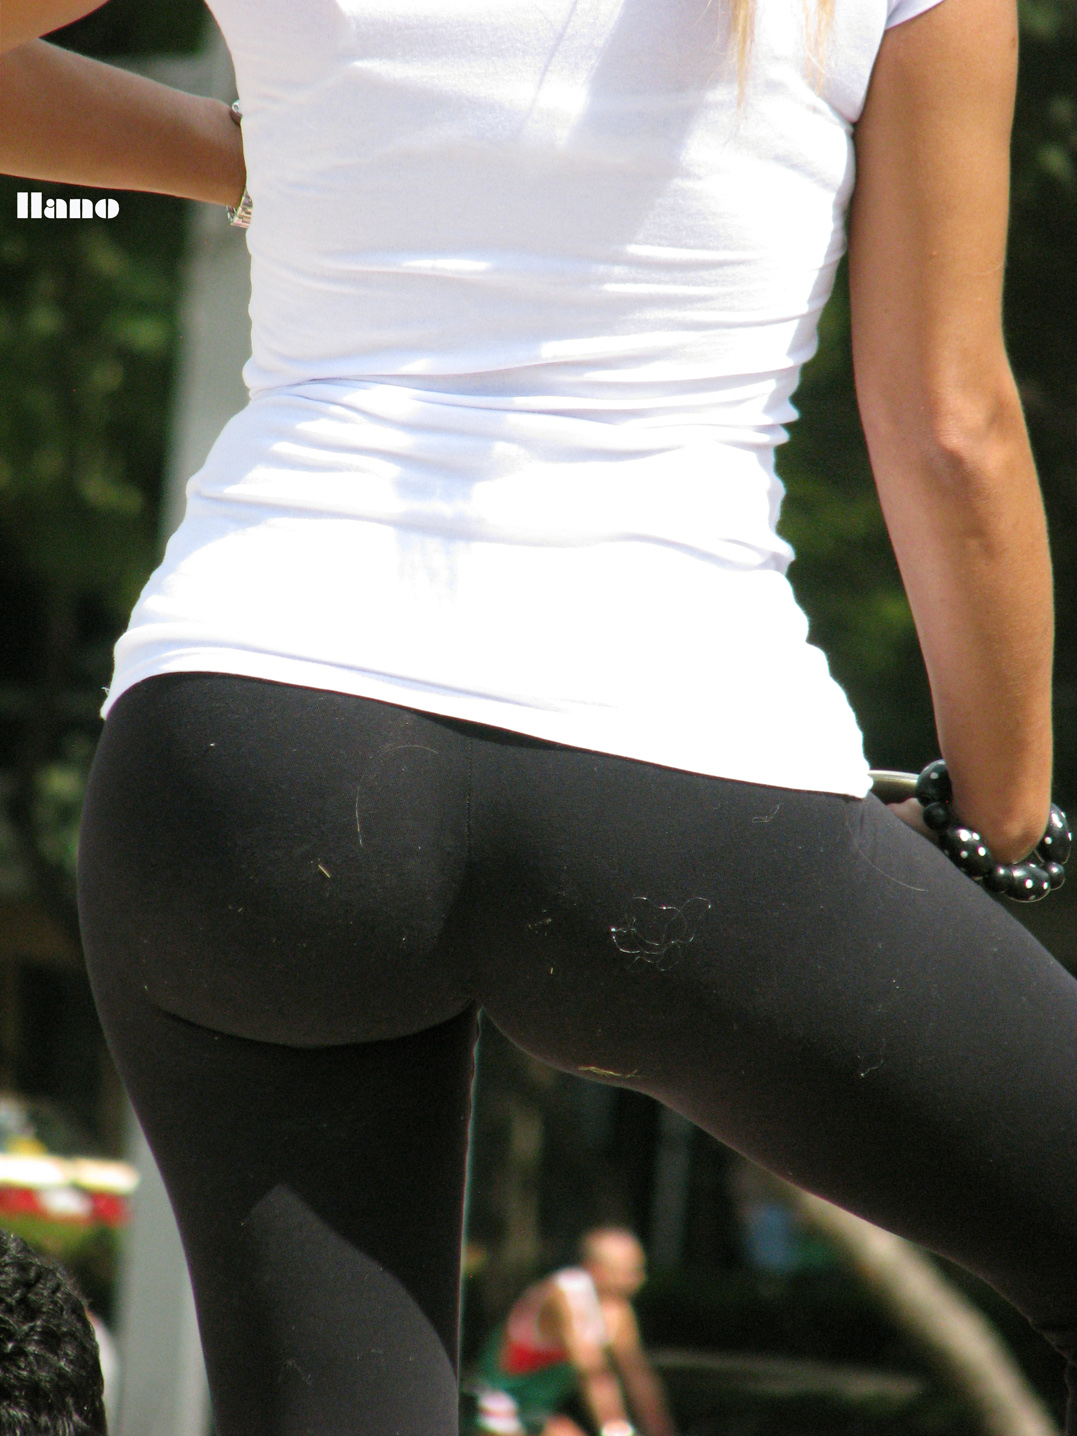 perfect ass in lycra divine butts street candid milf voyeur blog. Black Bedroom Furniture Sets. Home Design Ideas